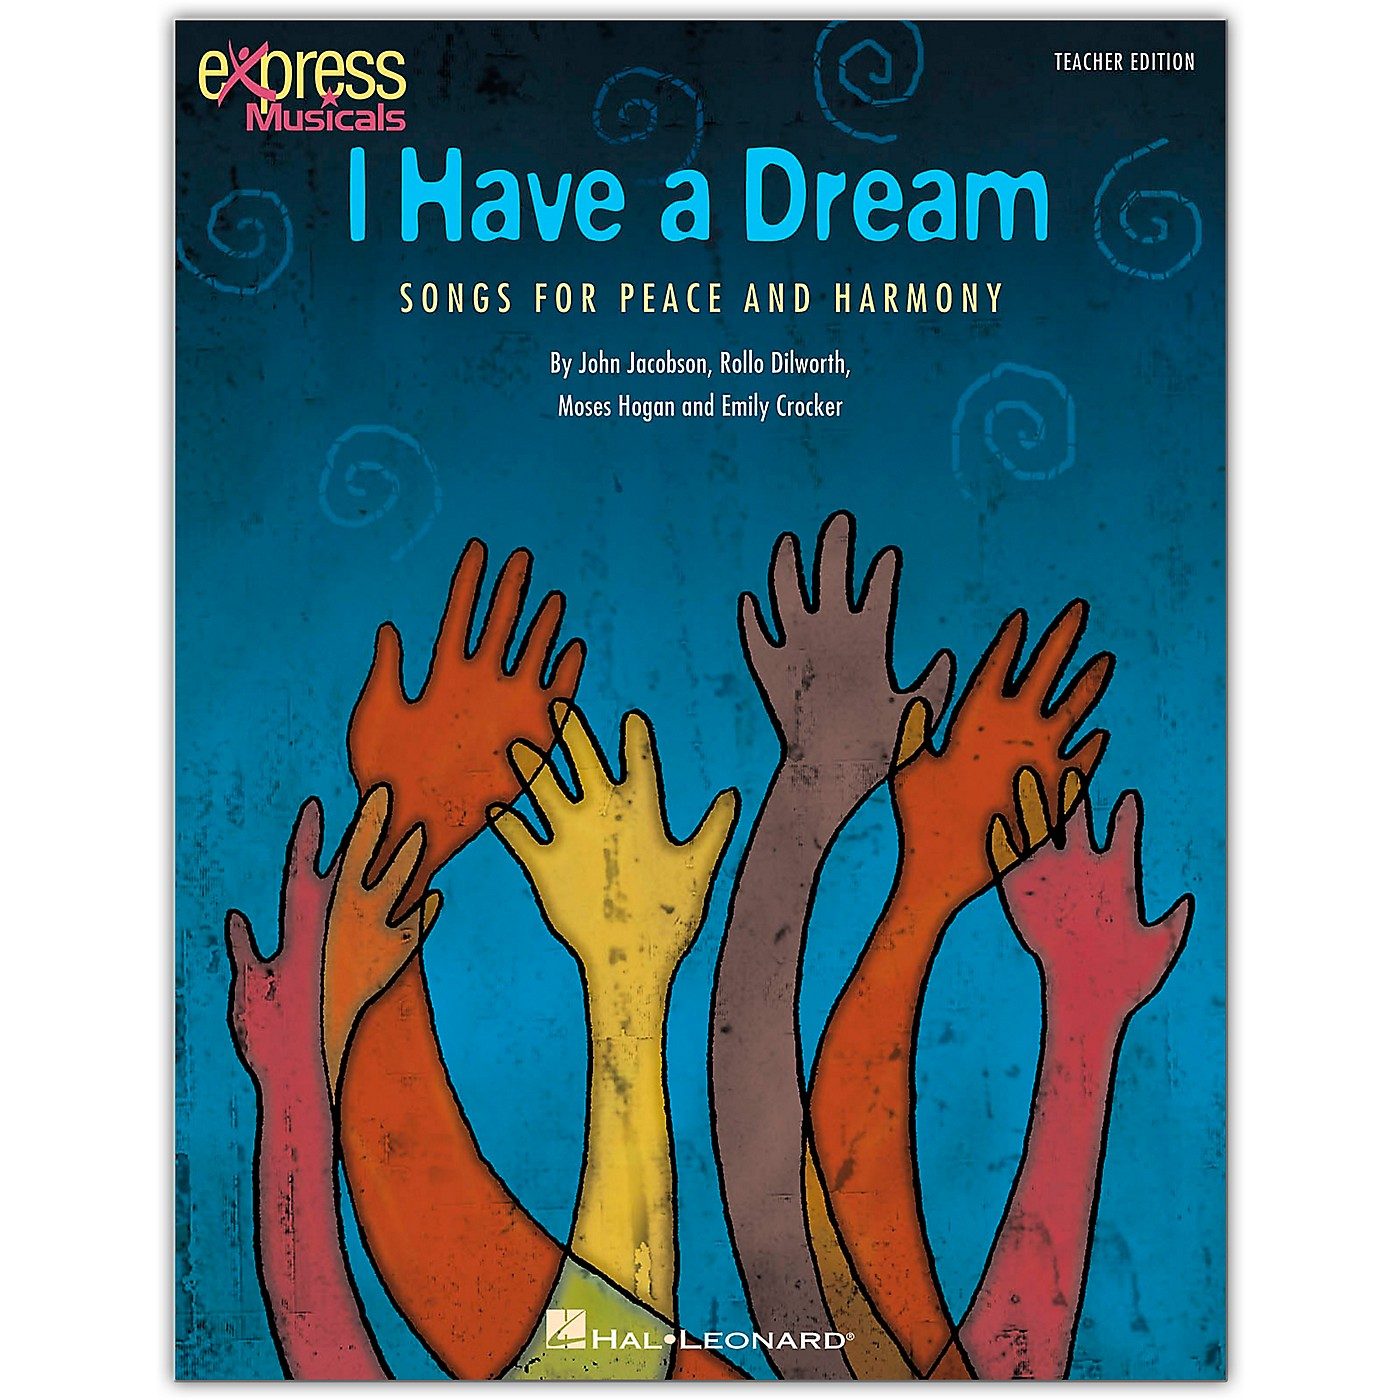 Hal Leonard I Have A Dream - Songs for Peace and Harmony Classroom Kit thumbnail